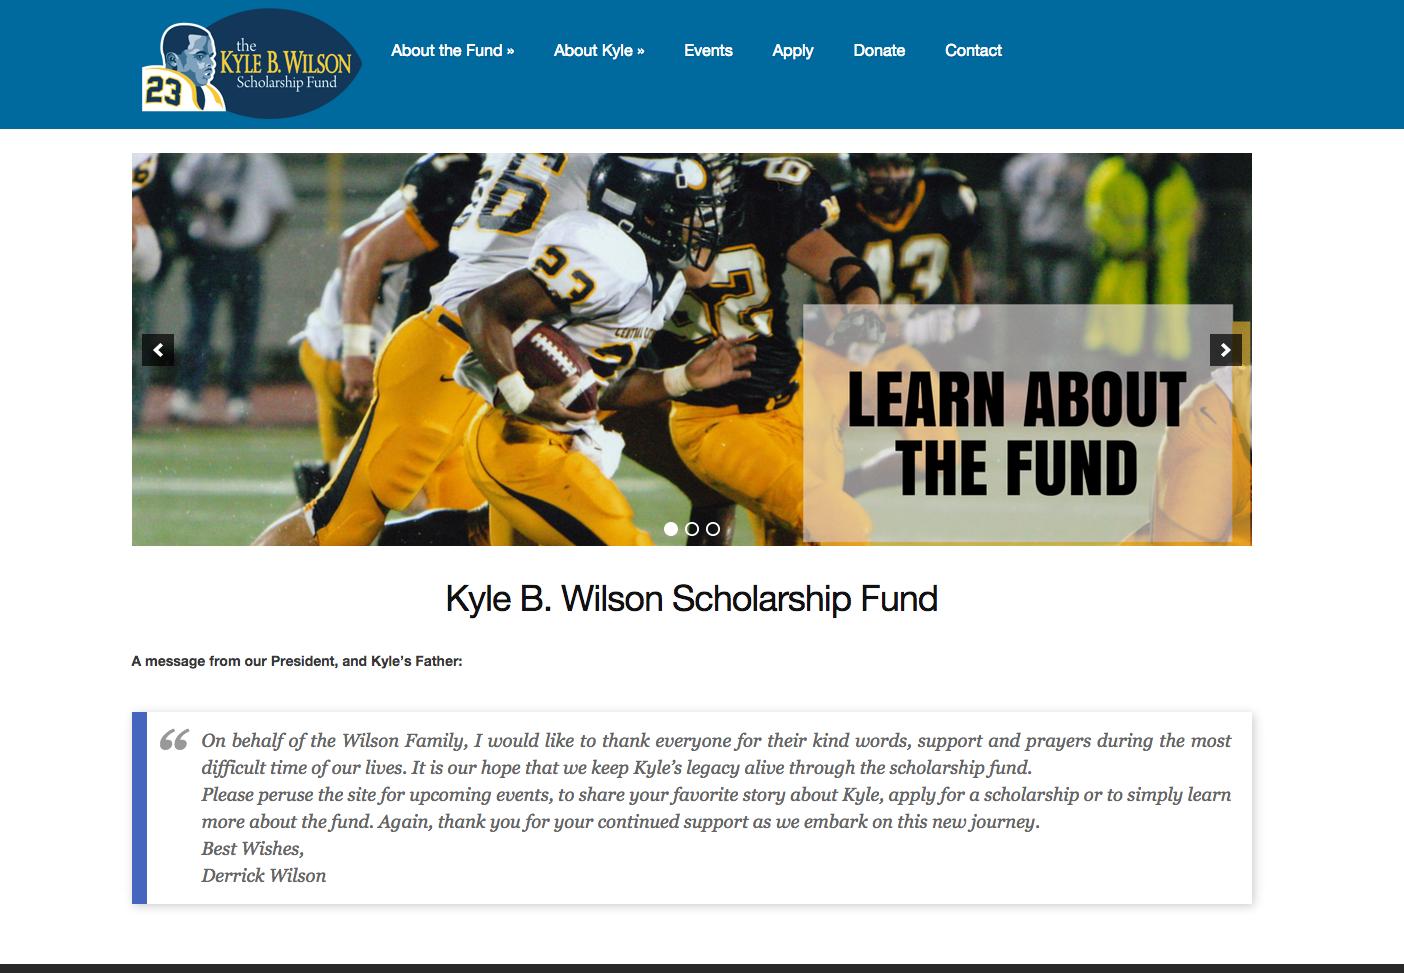 Kyle Wilson Scholarship Fund